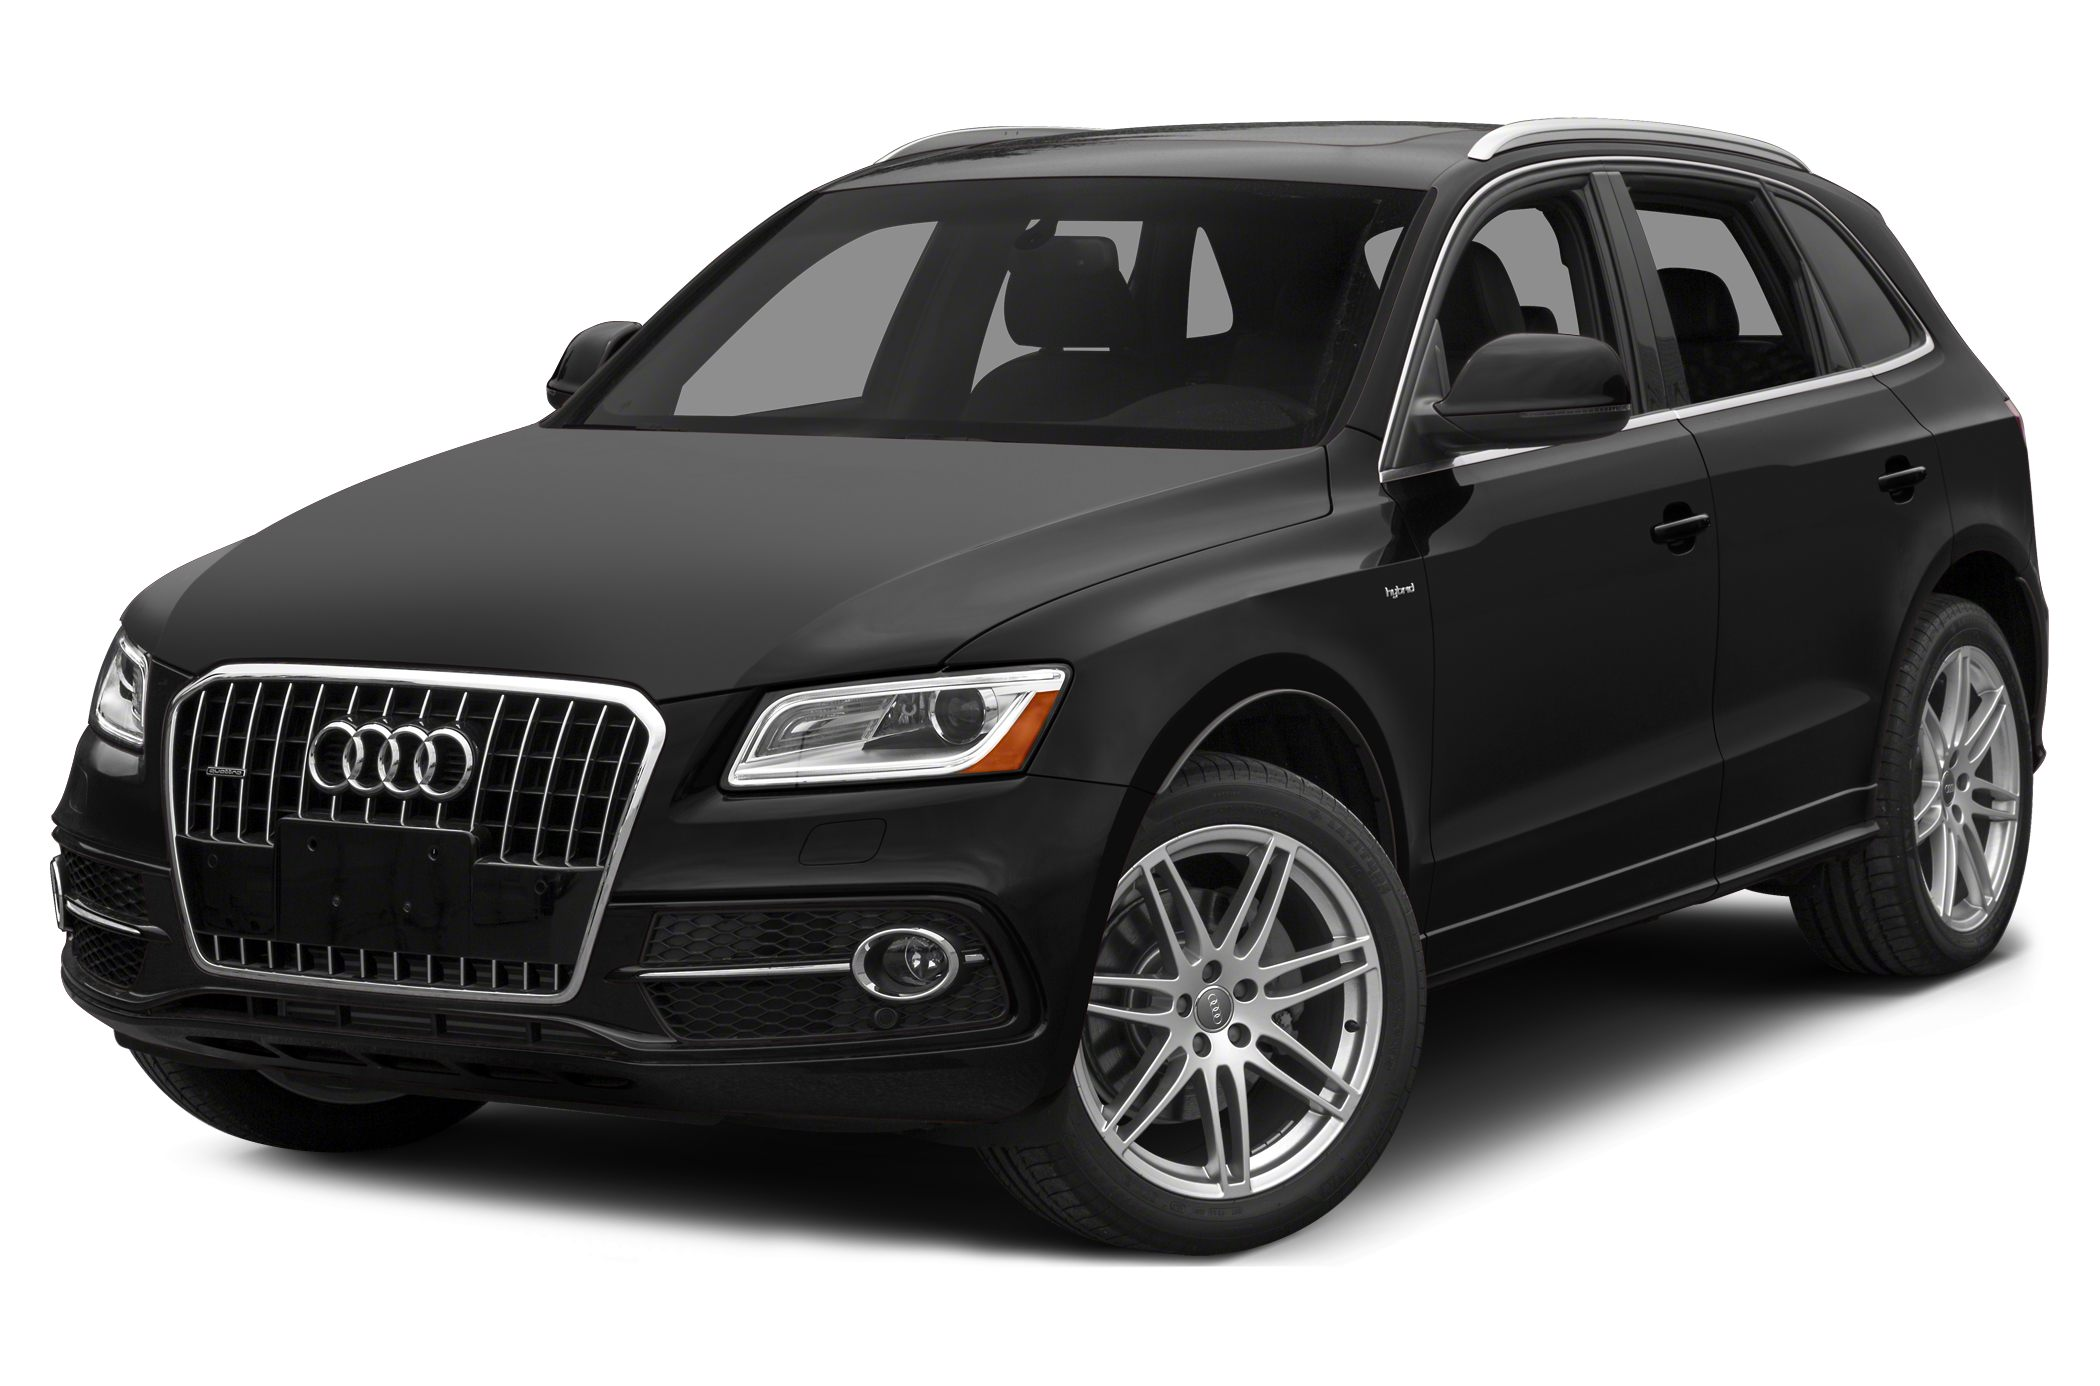 2014 Audi Q5 hybrid